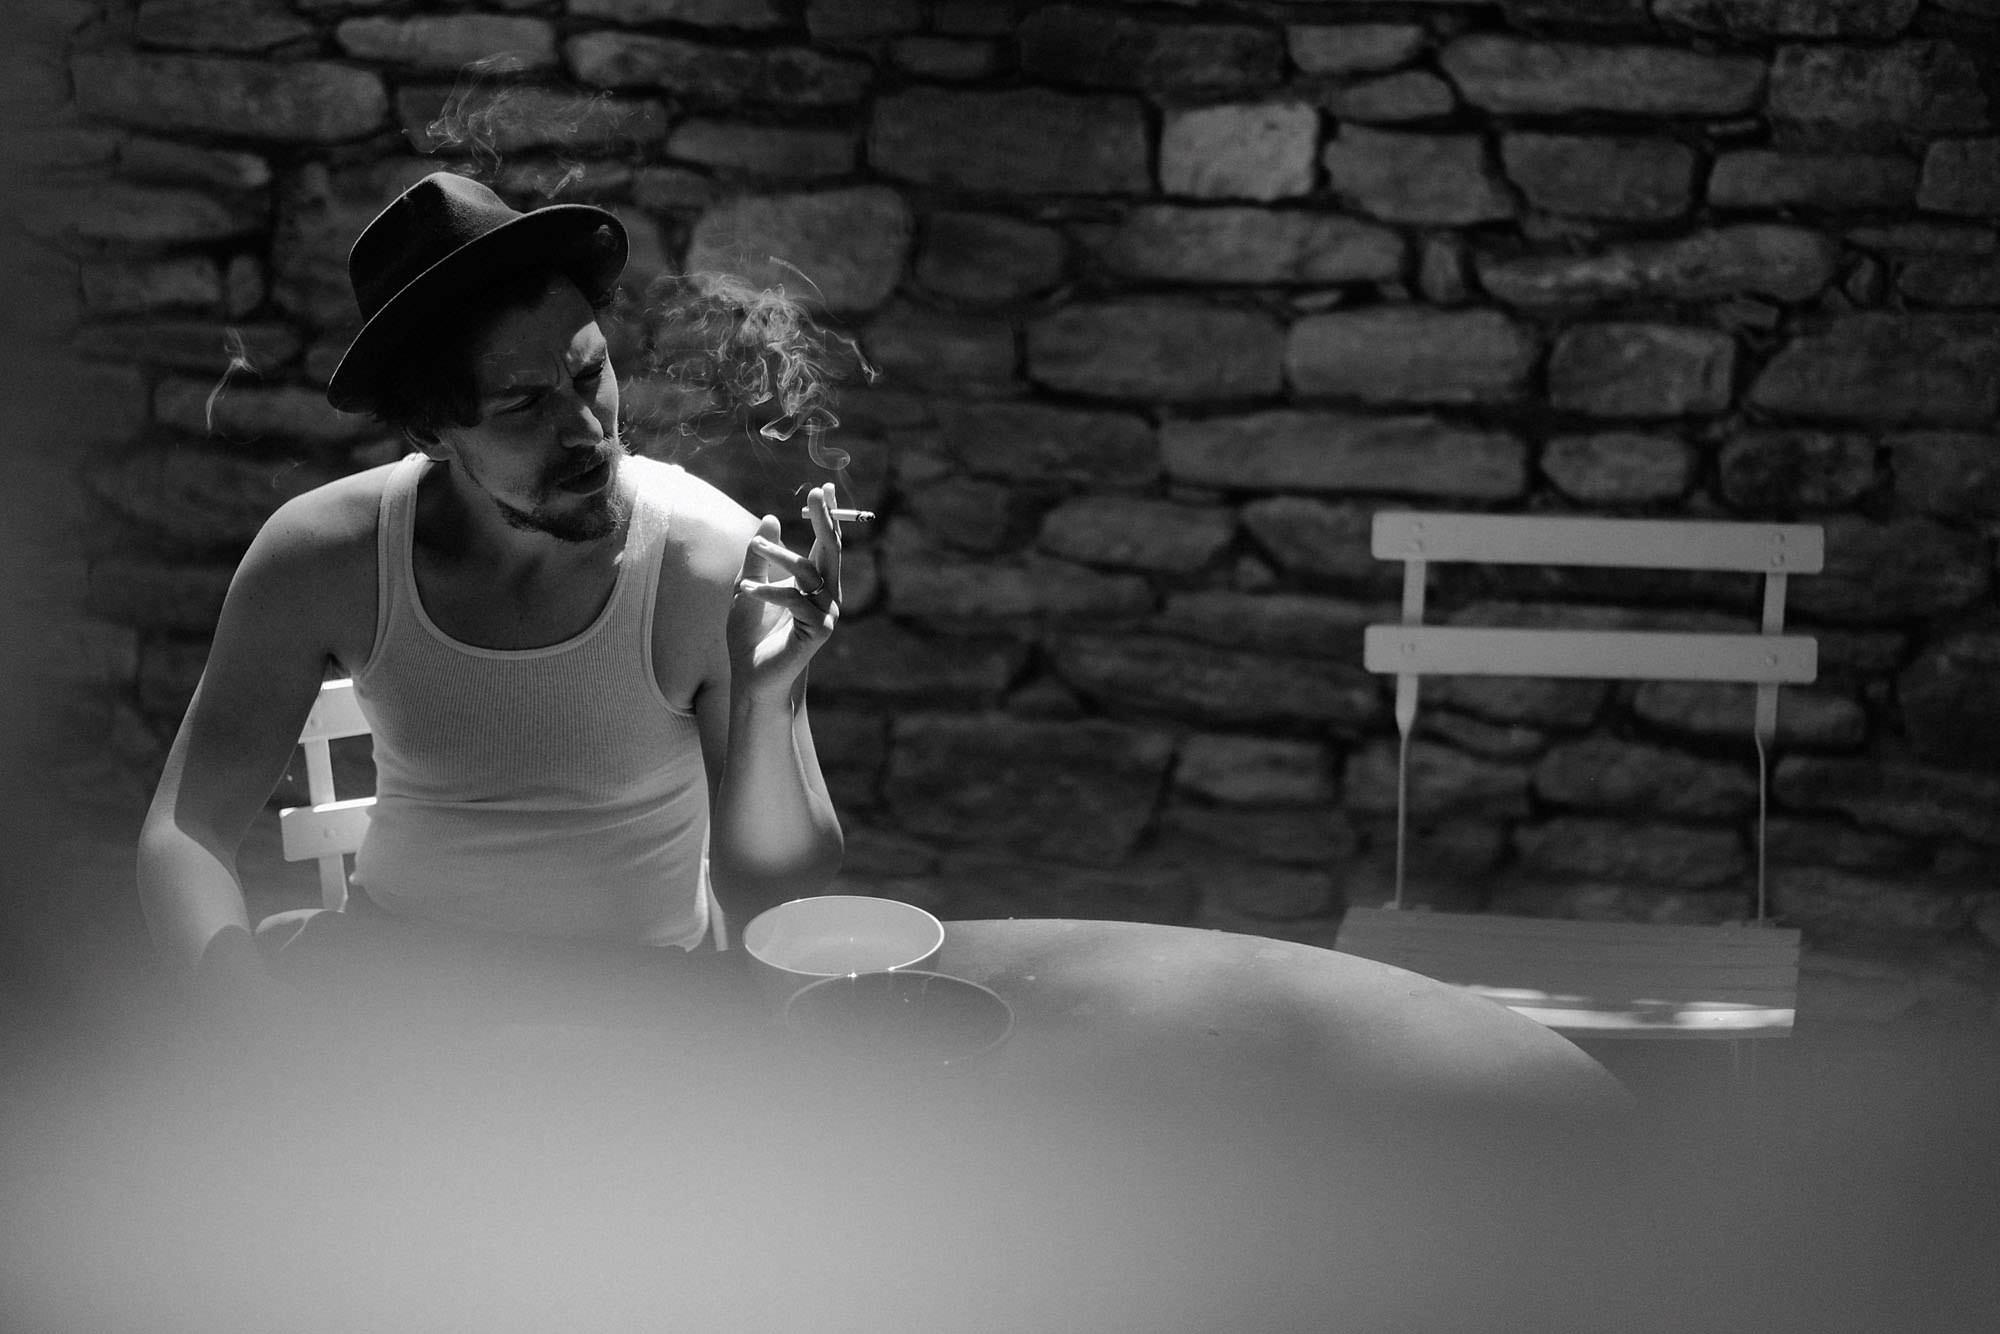 goult provence france groom cigarette photo